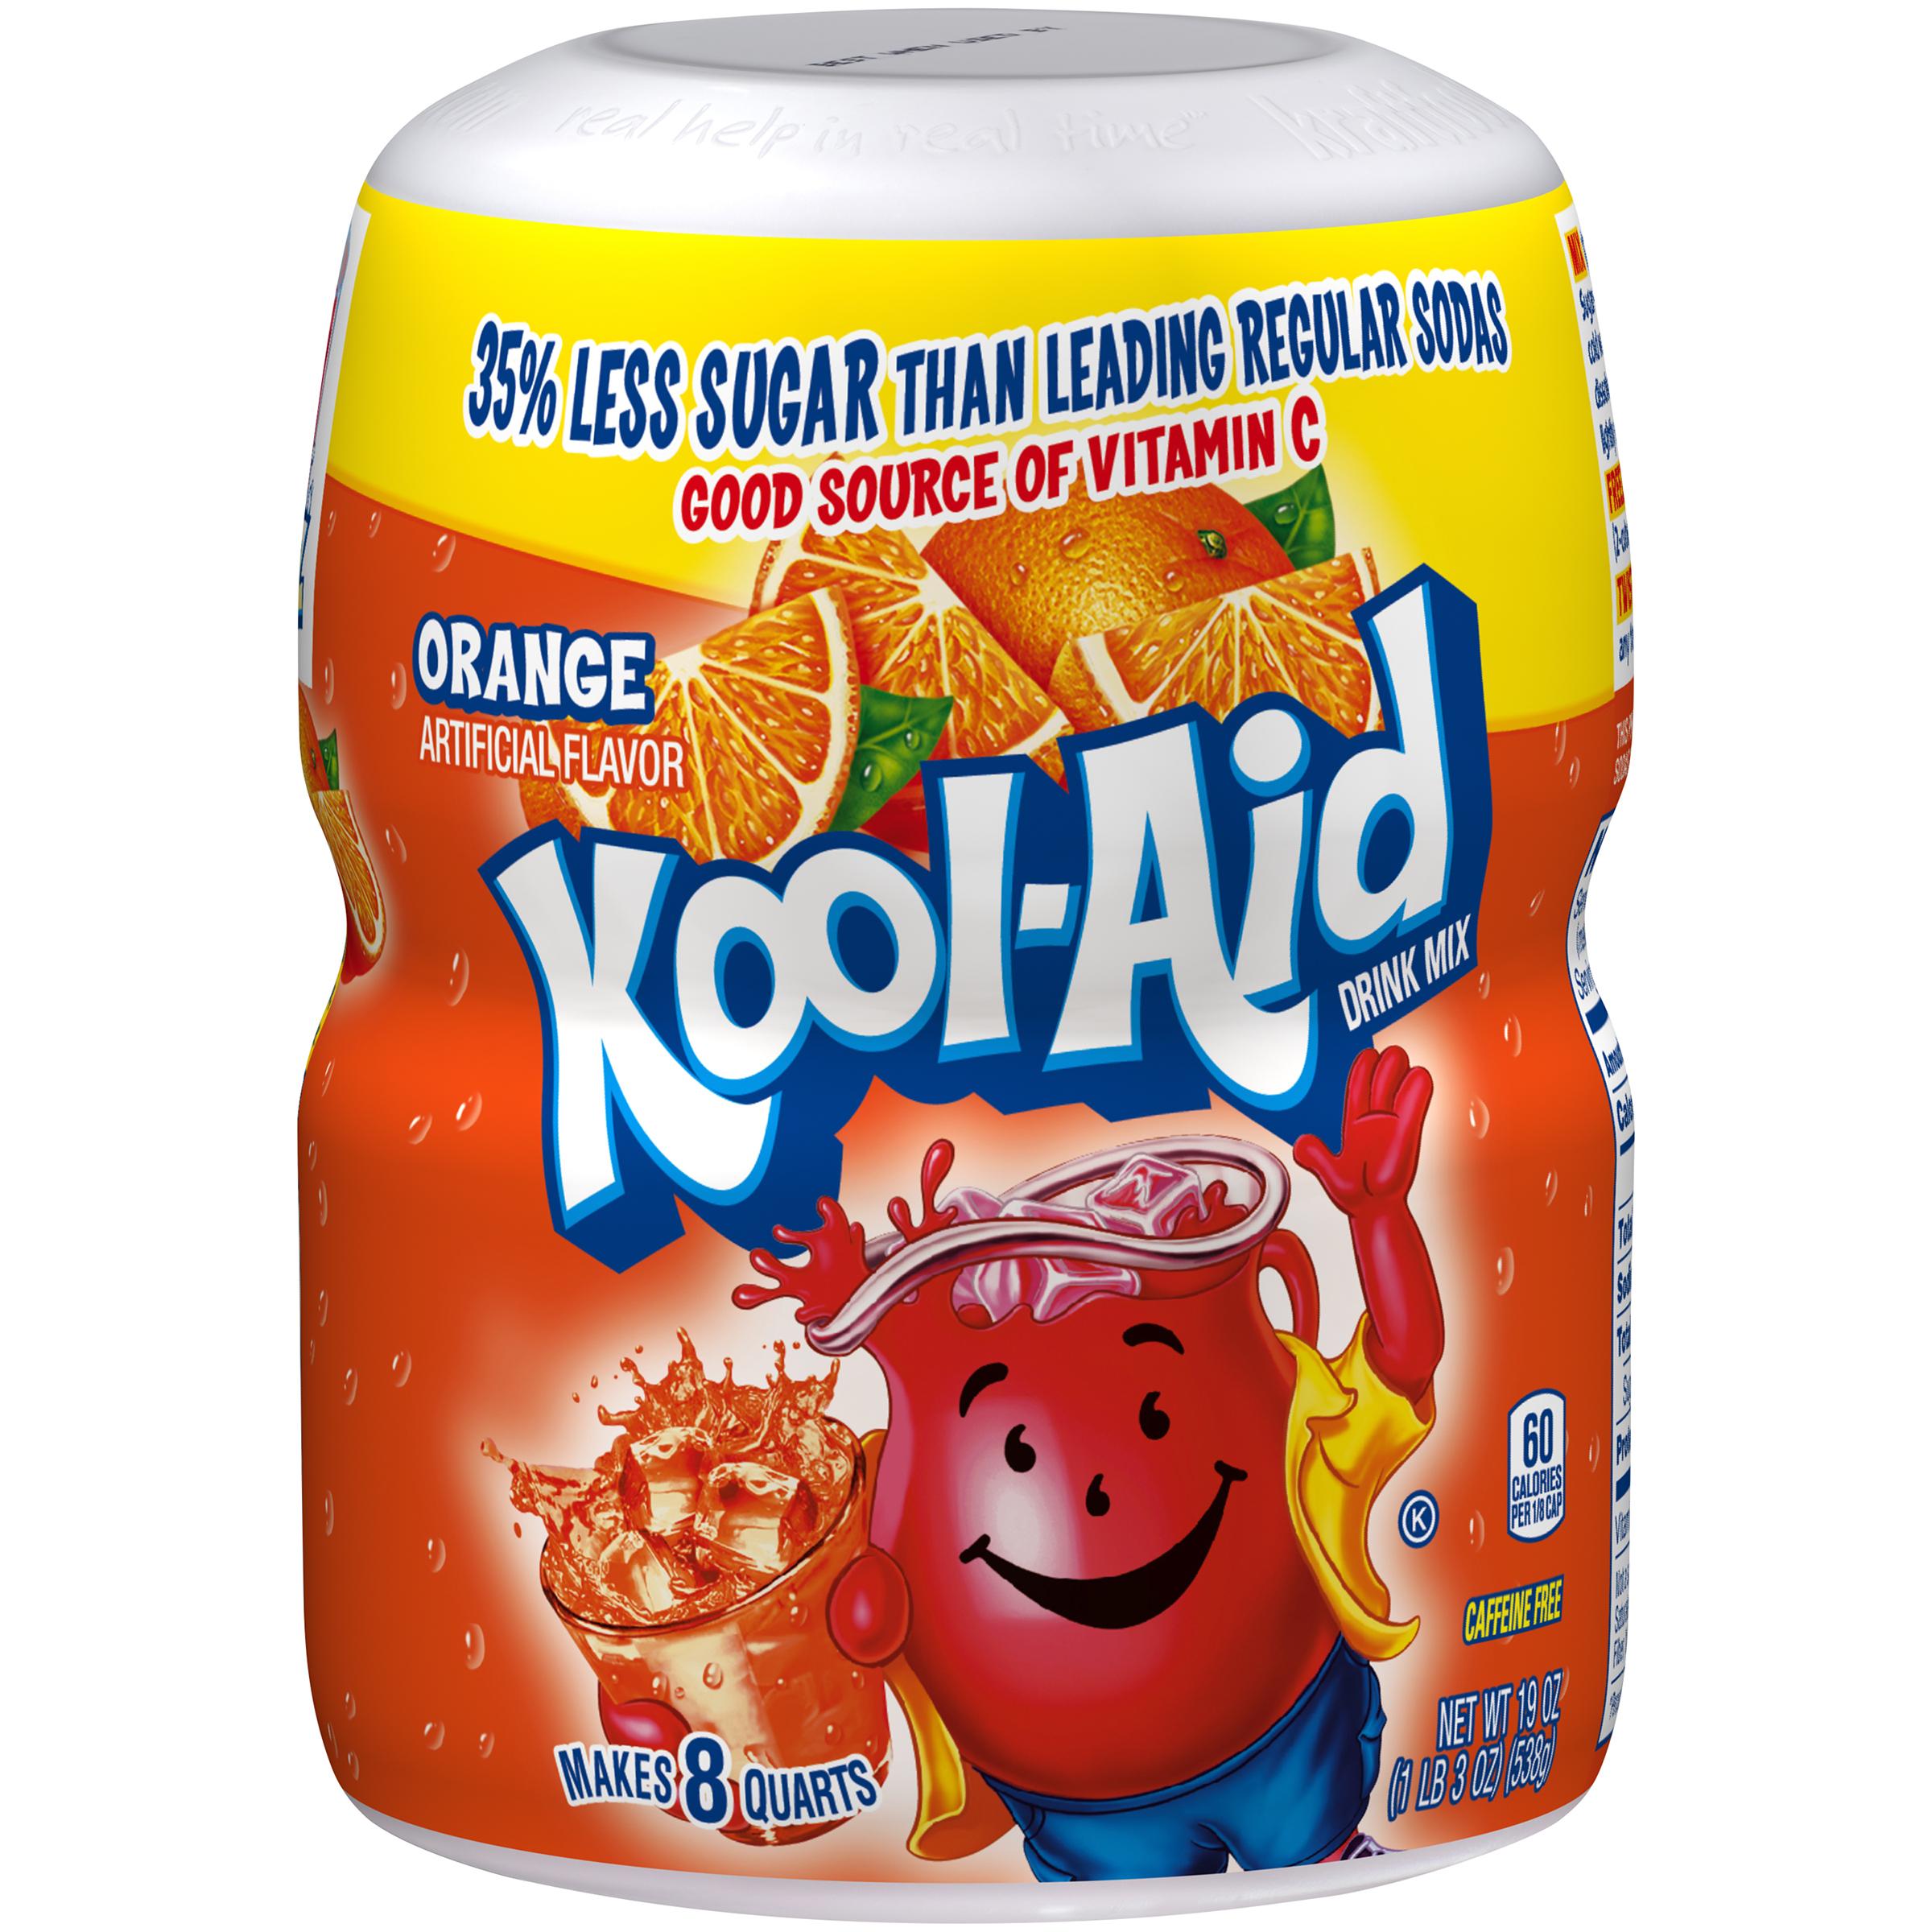 Kool-Aid Orange Drink Mix 19 oz. Canister image